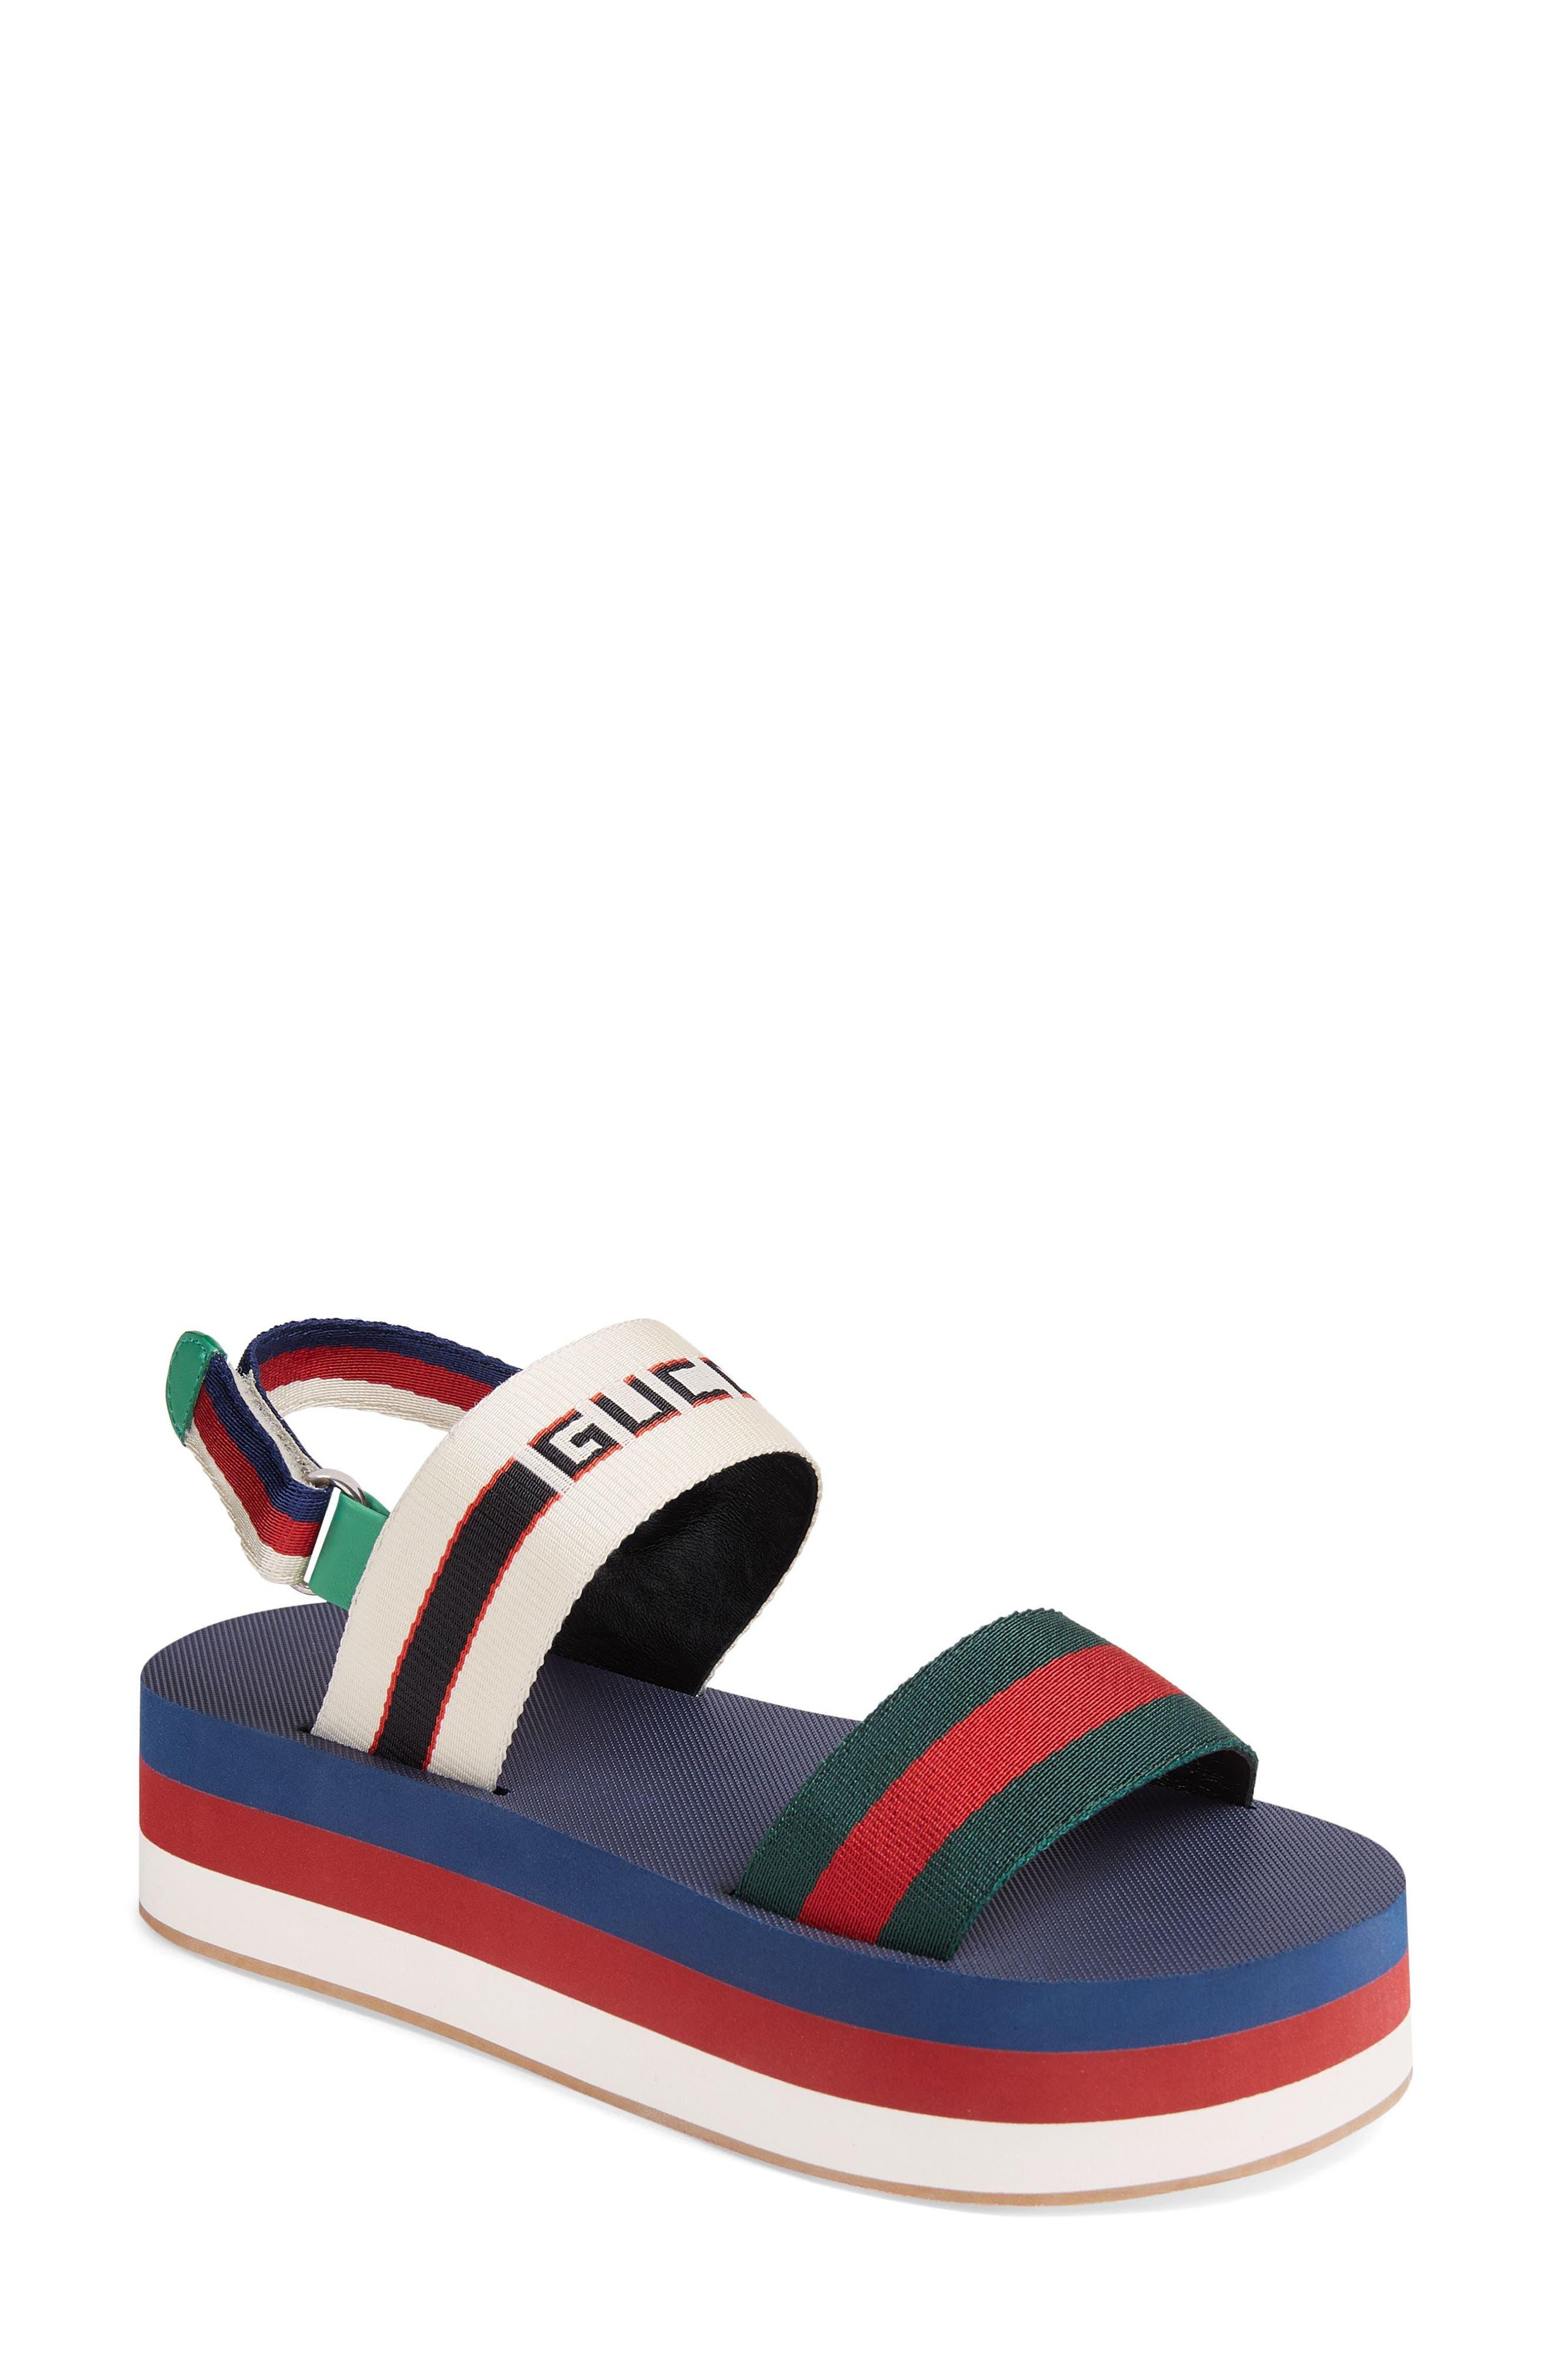 Slingback Flatform Sandal,                             Main thumbnail 1, color,                             Blue/ Red